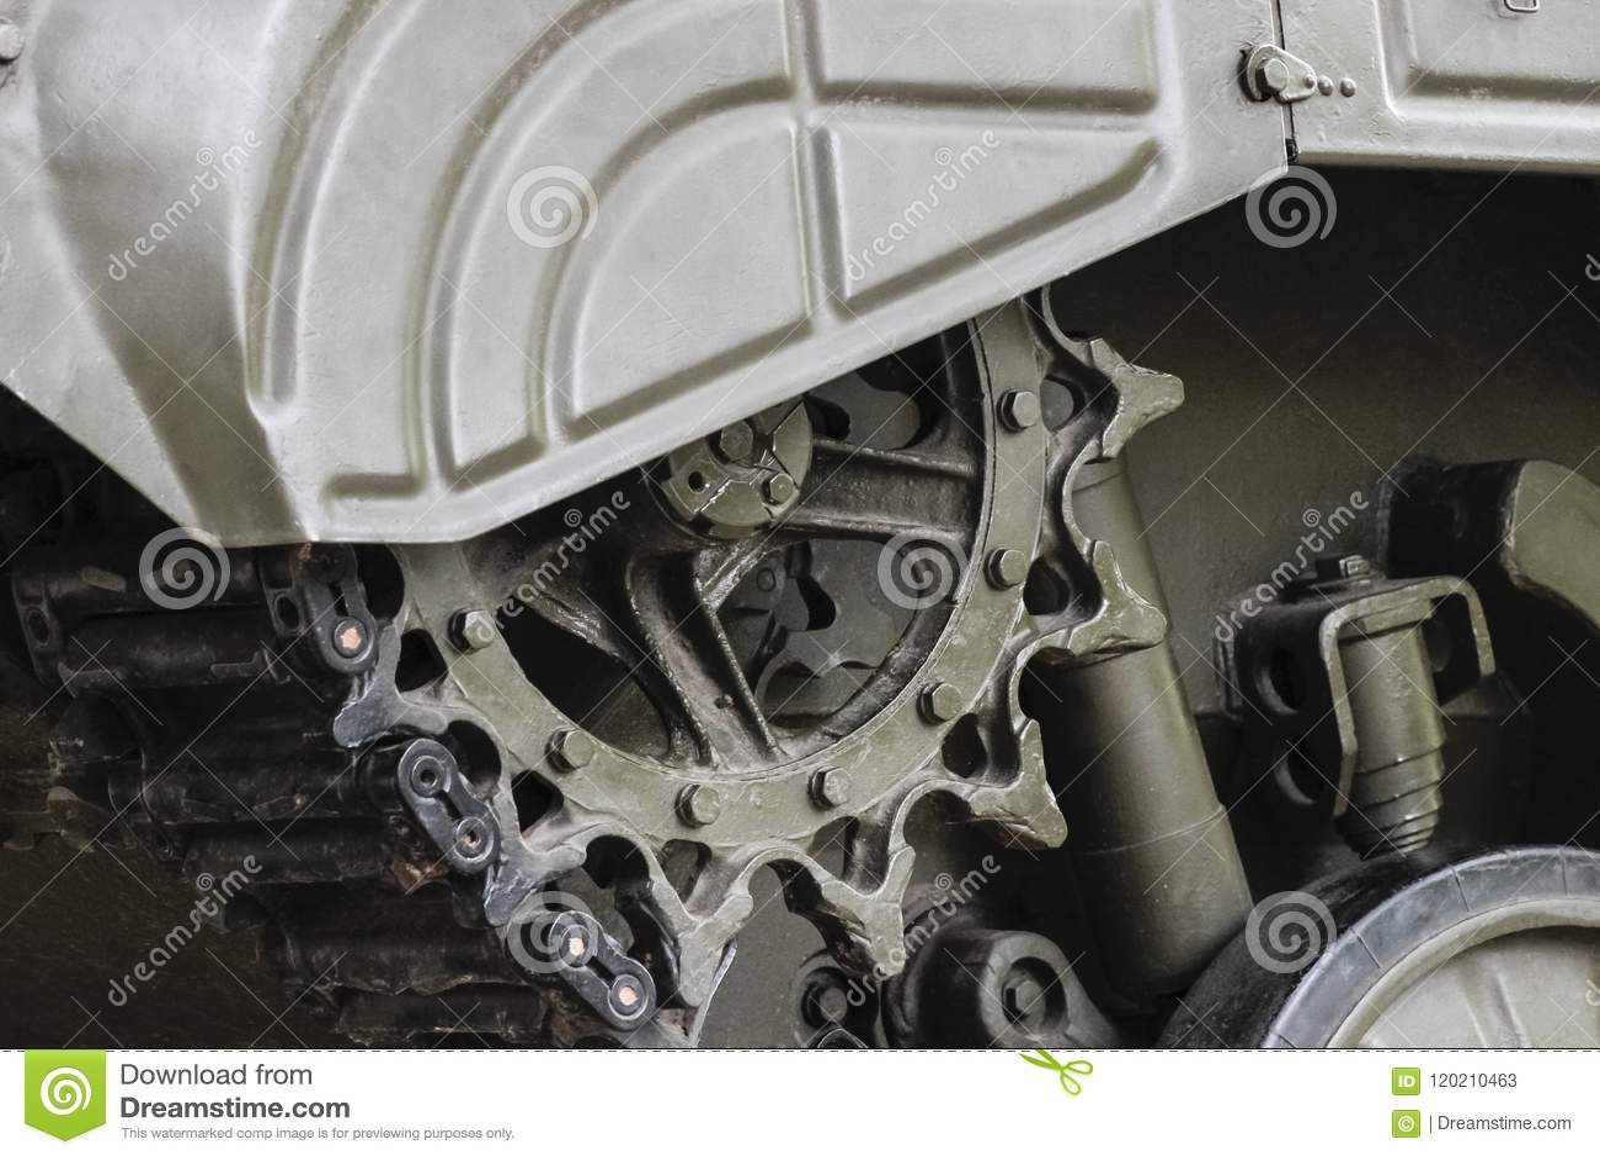 Guiding wheel of a military tank